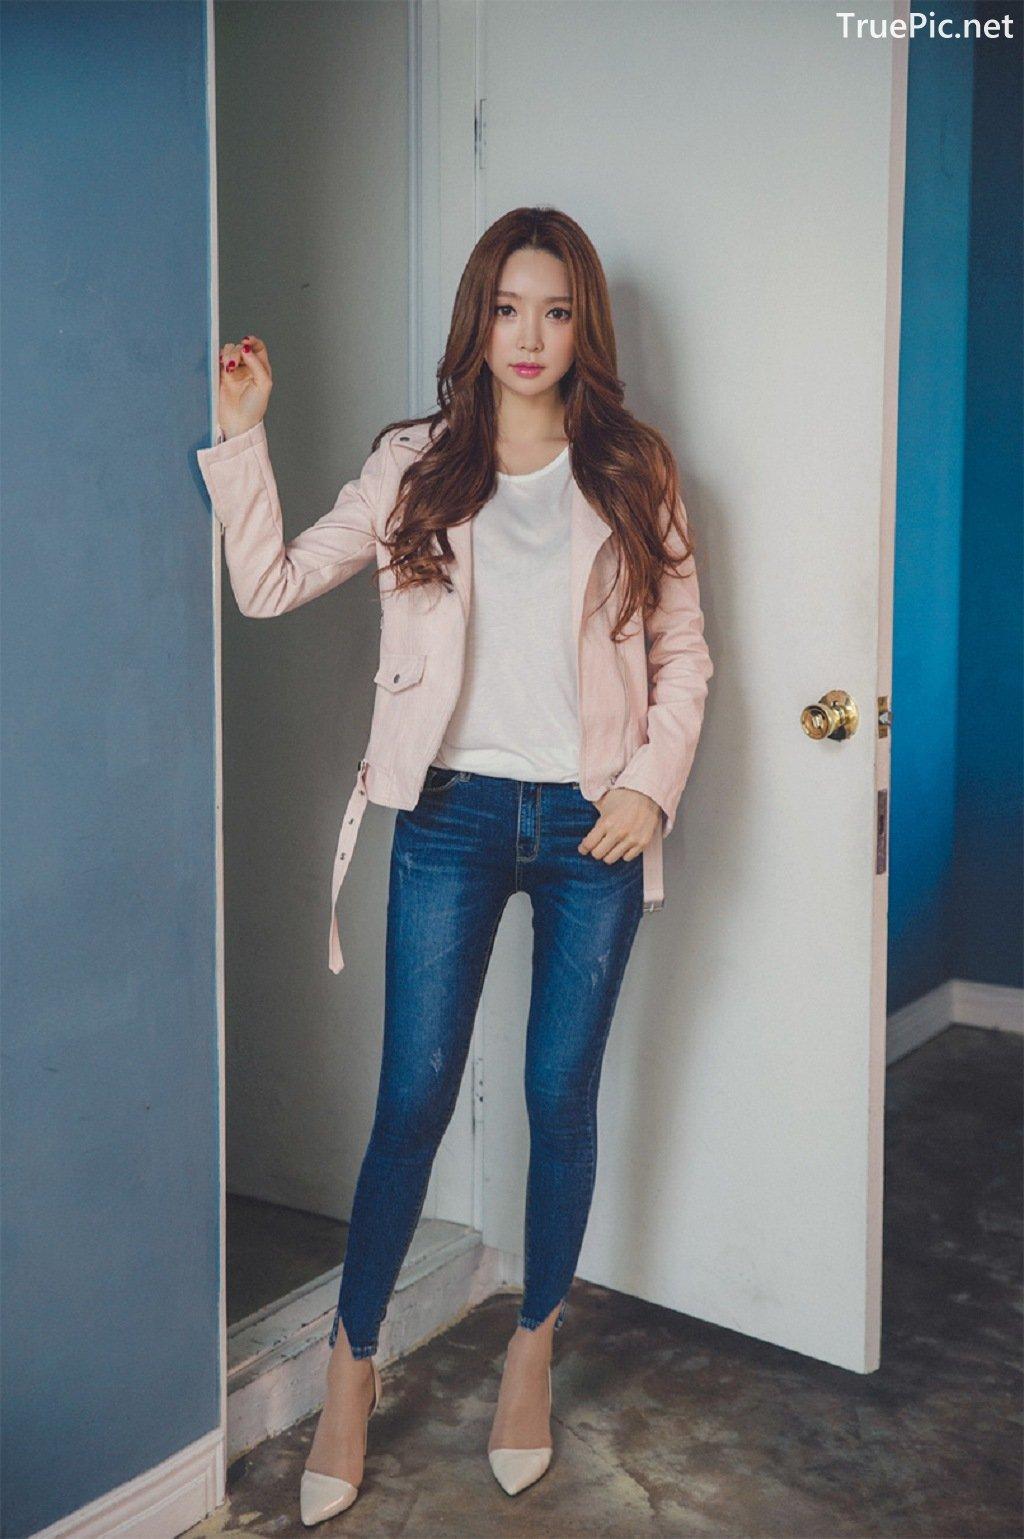 Image-Korean-Fashion-Model–Park-Soo-Yeon–Indoor-Photoshoot-Collection-TruePic.nett- Picture-7